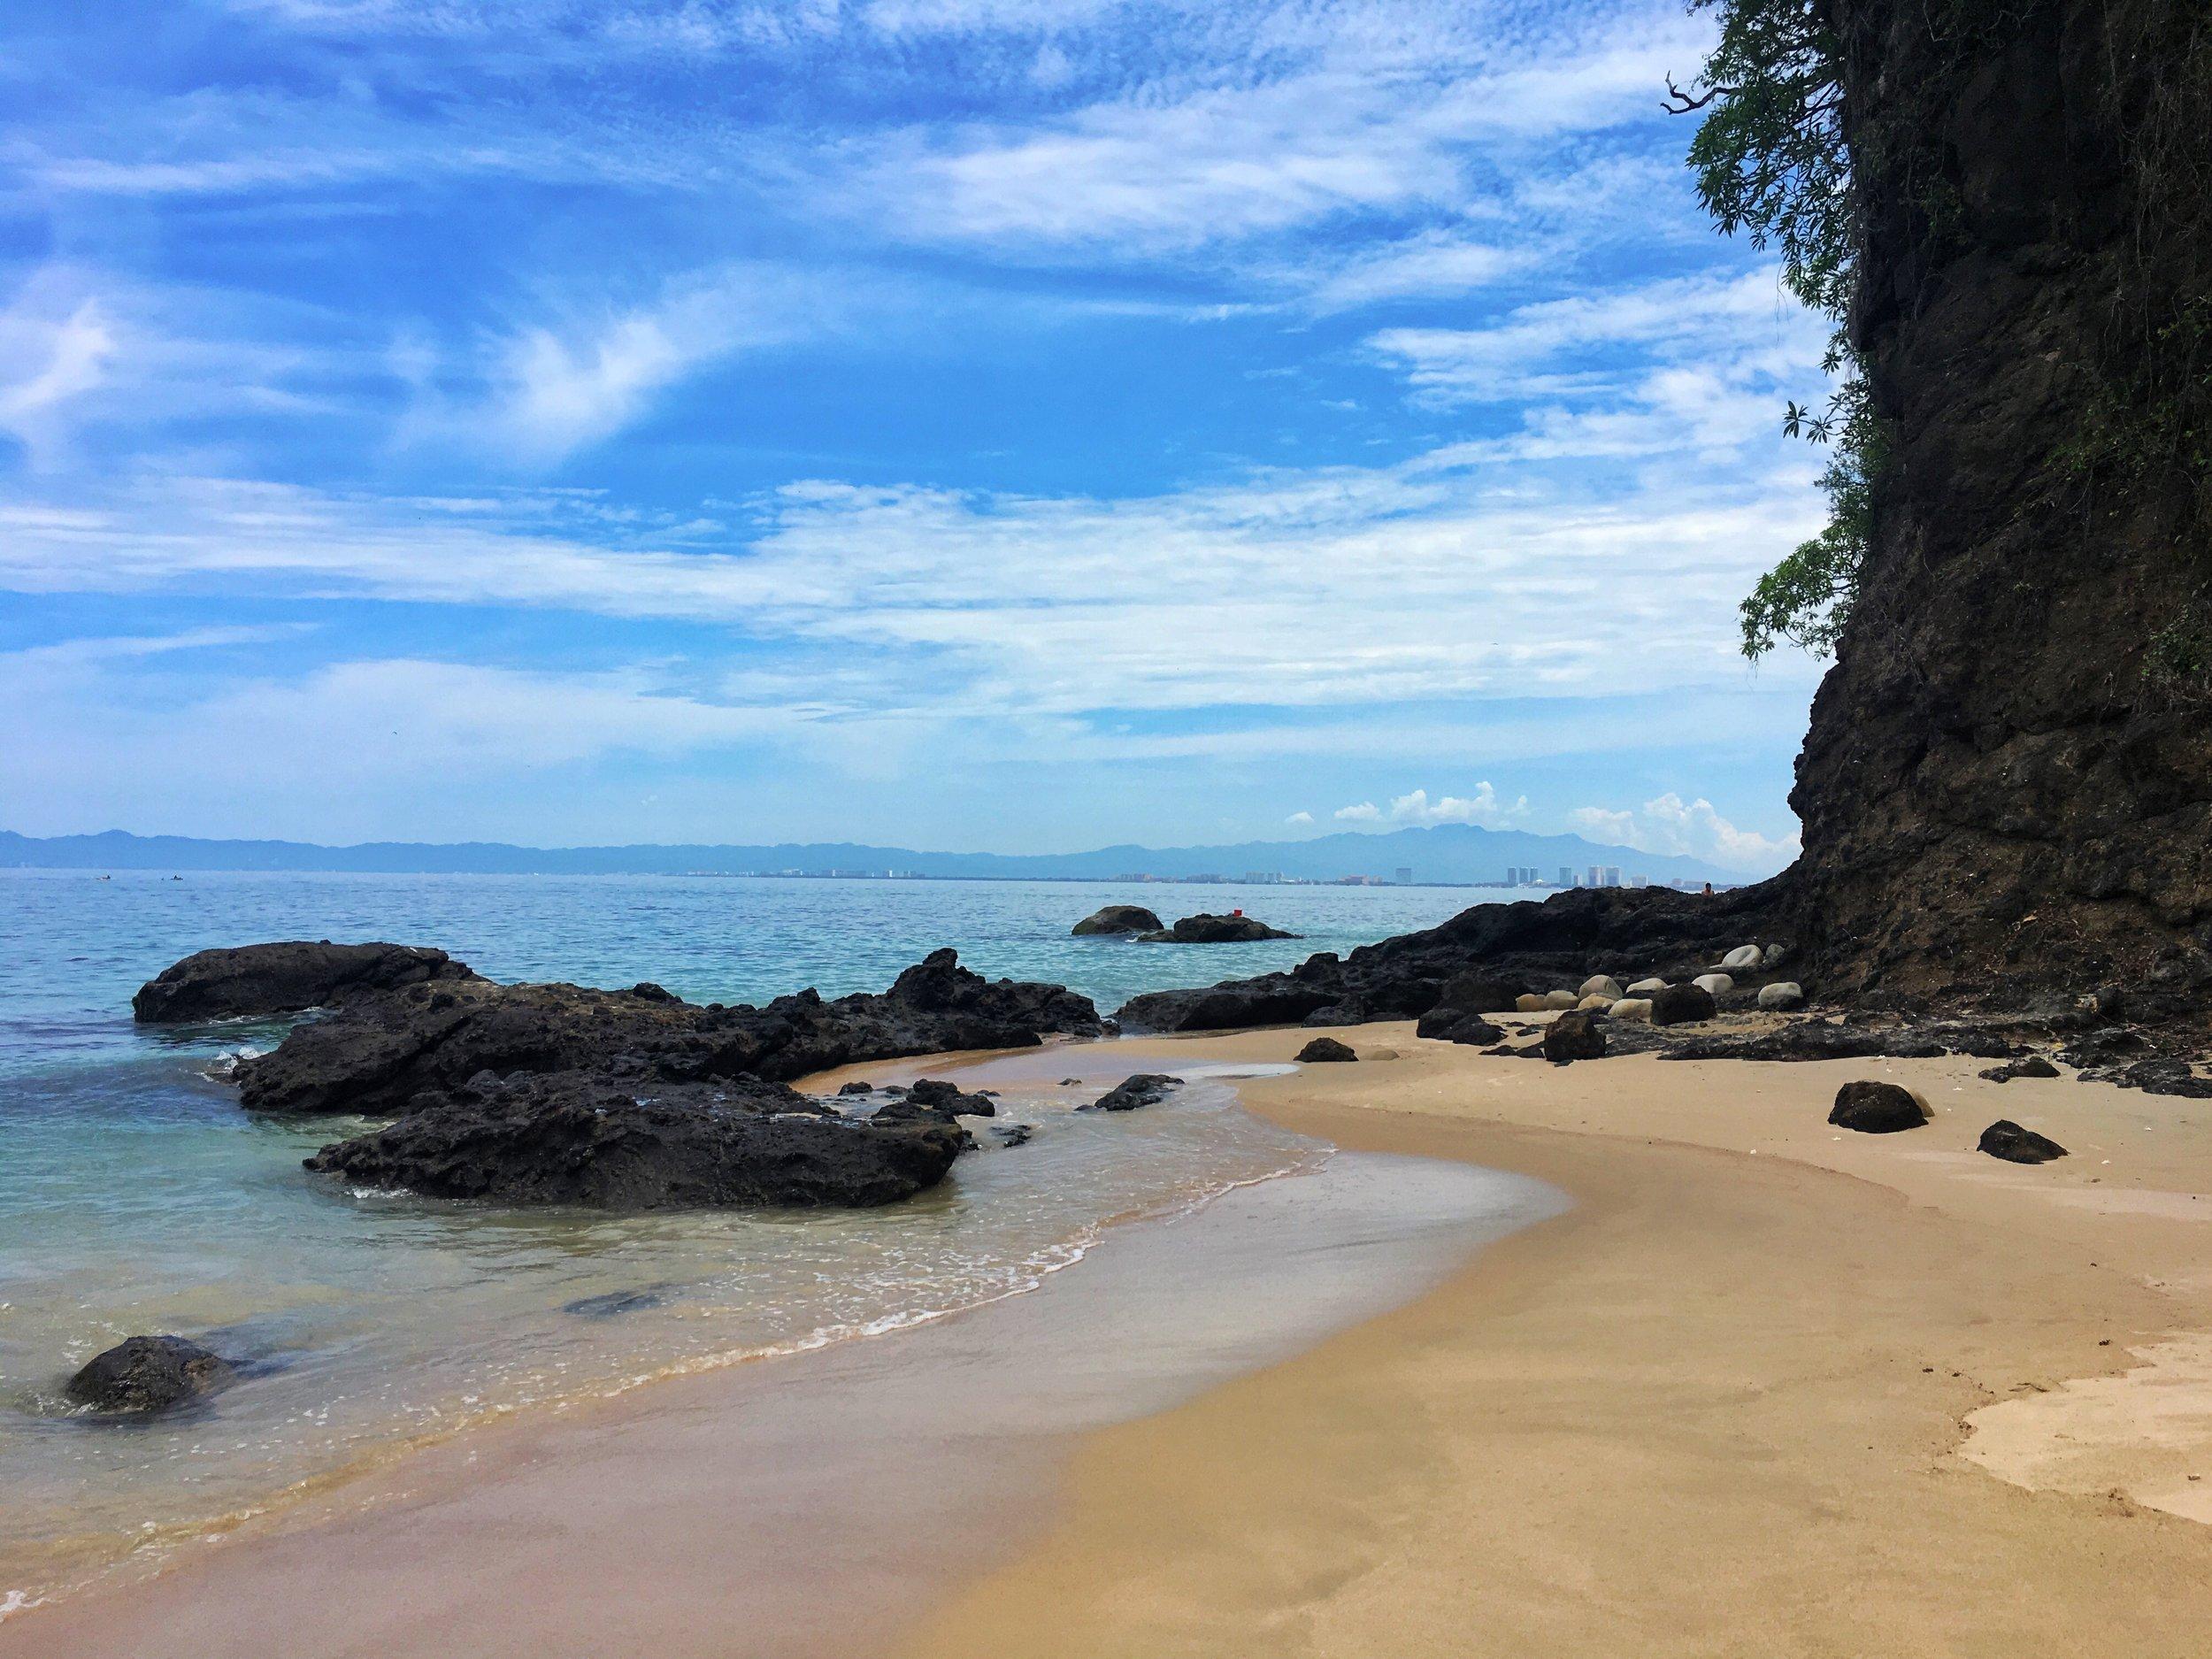 Facing the northern end of Playa Punta Negra